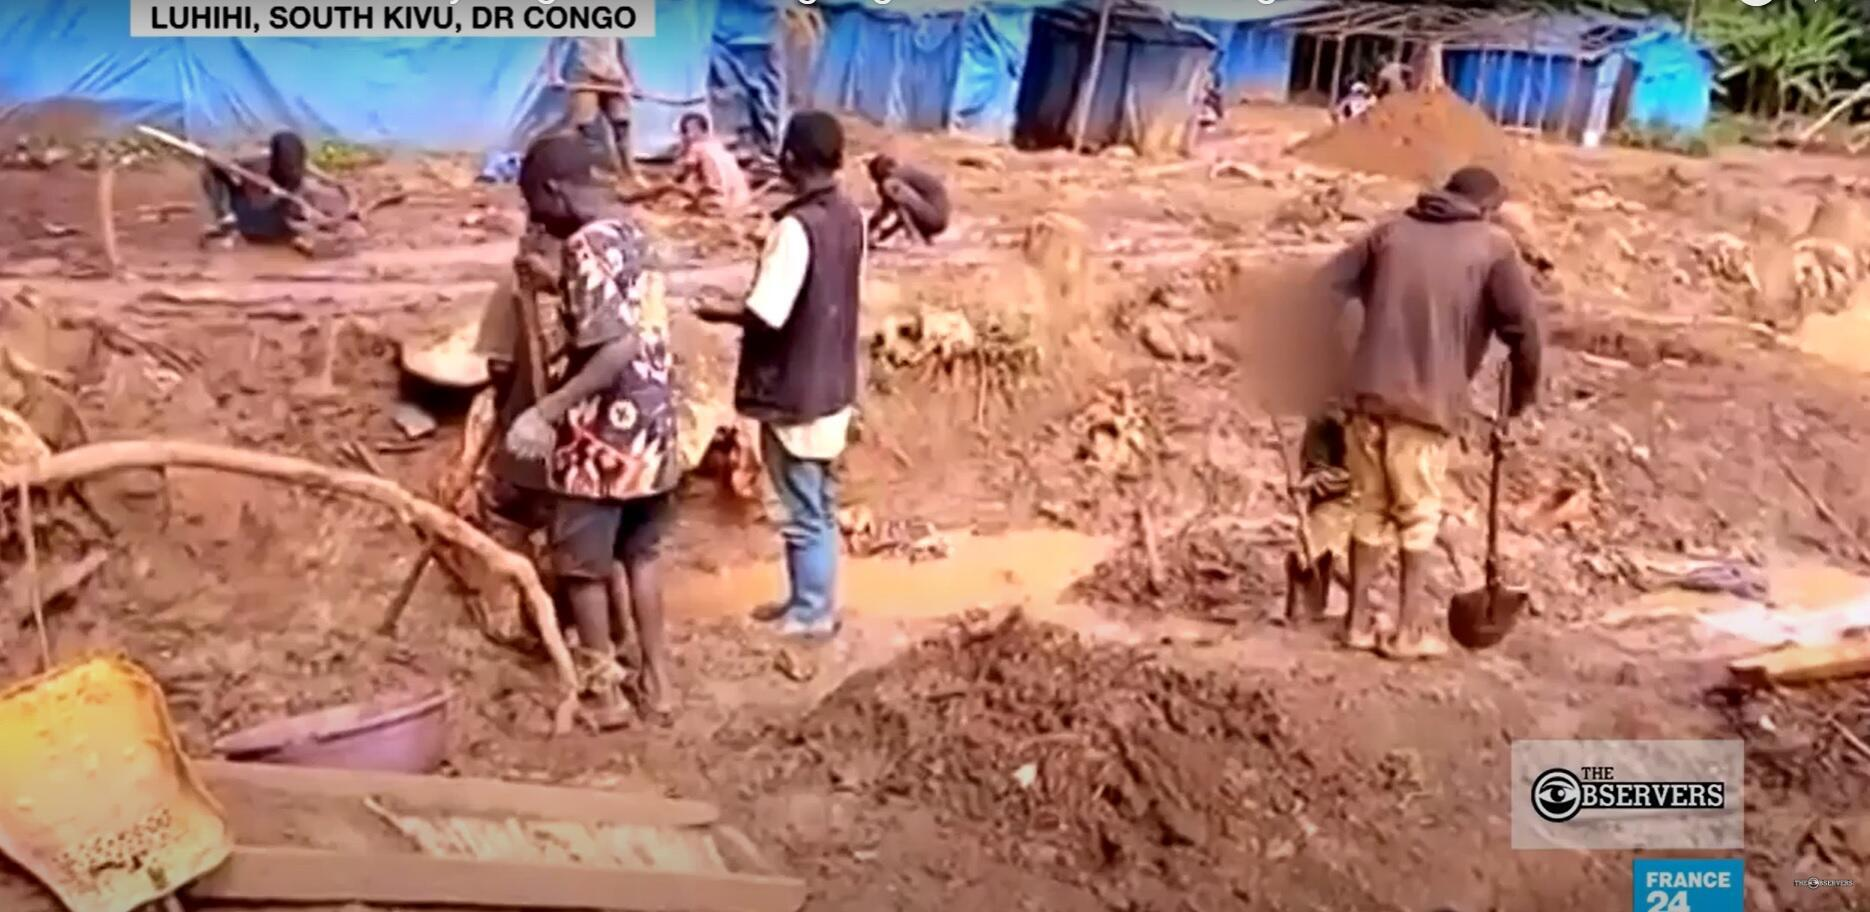 DRC photo